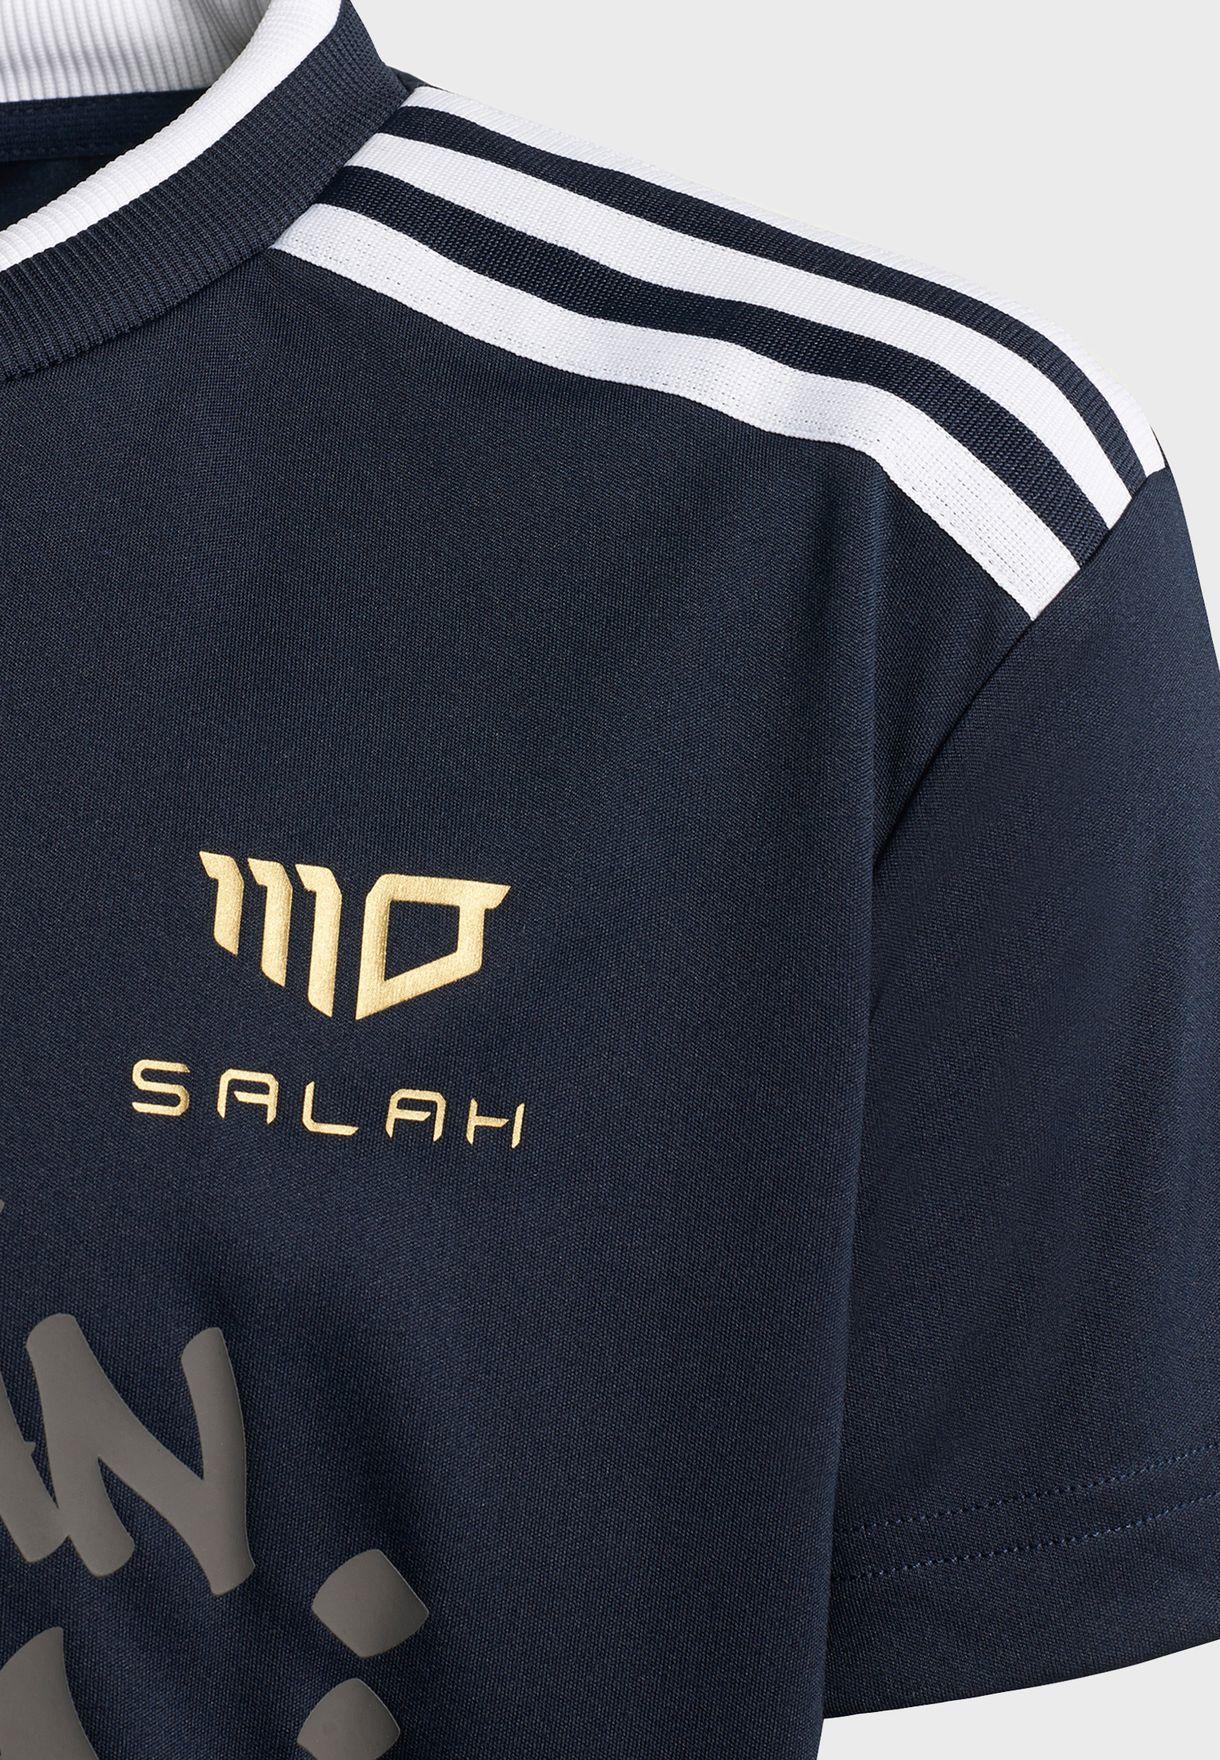 Youth Salah T-Shirt